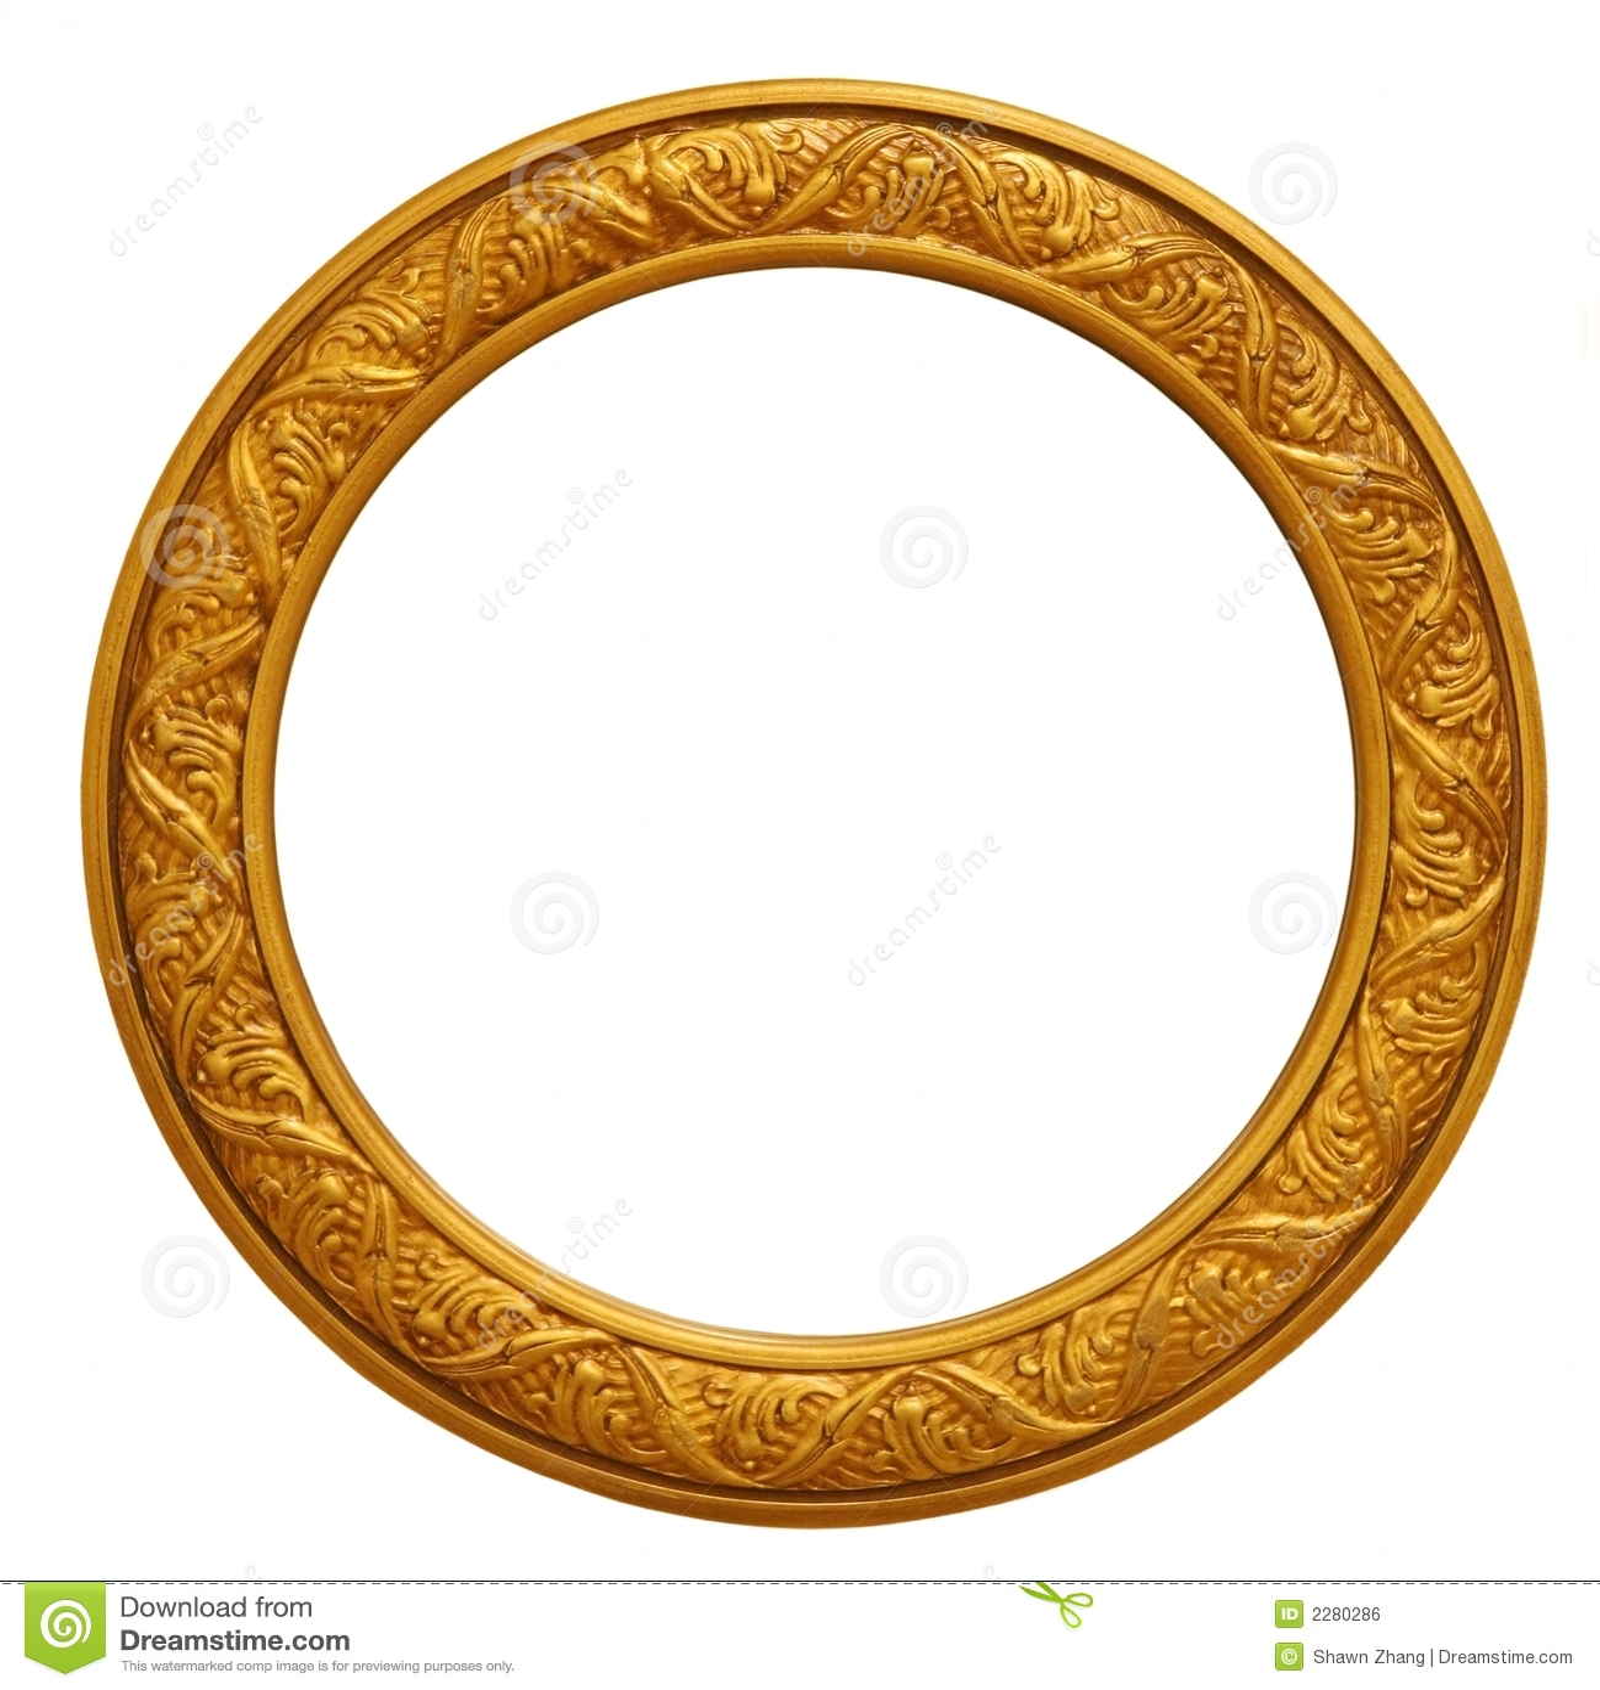 Circular Golden Picture Frame